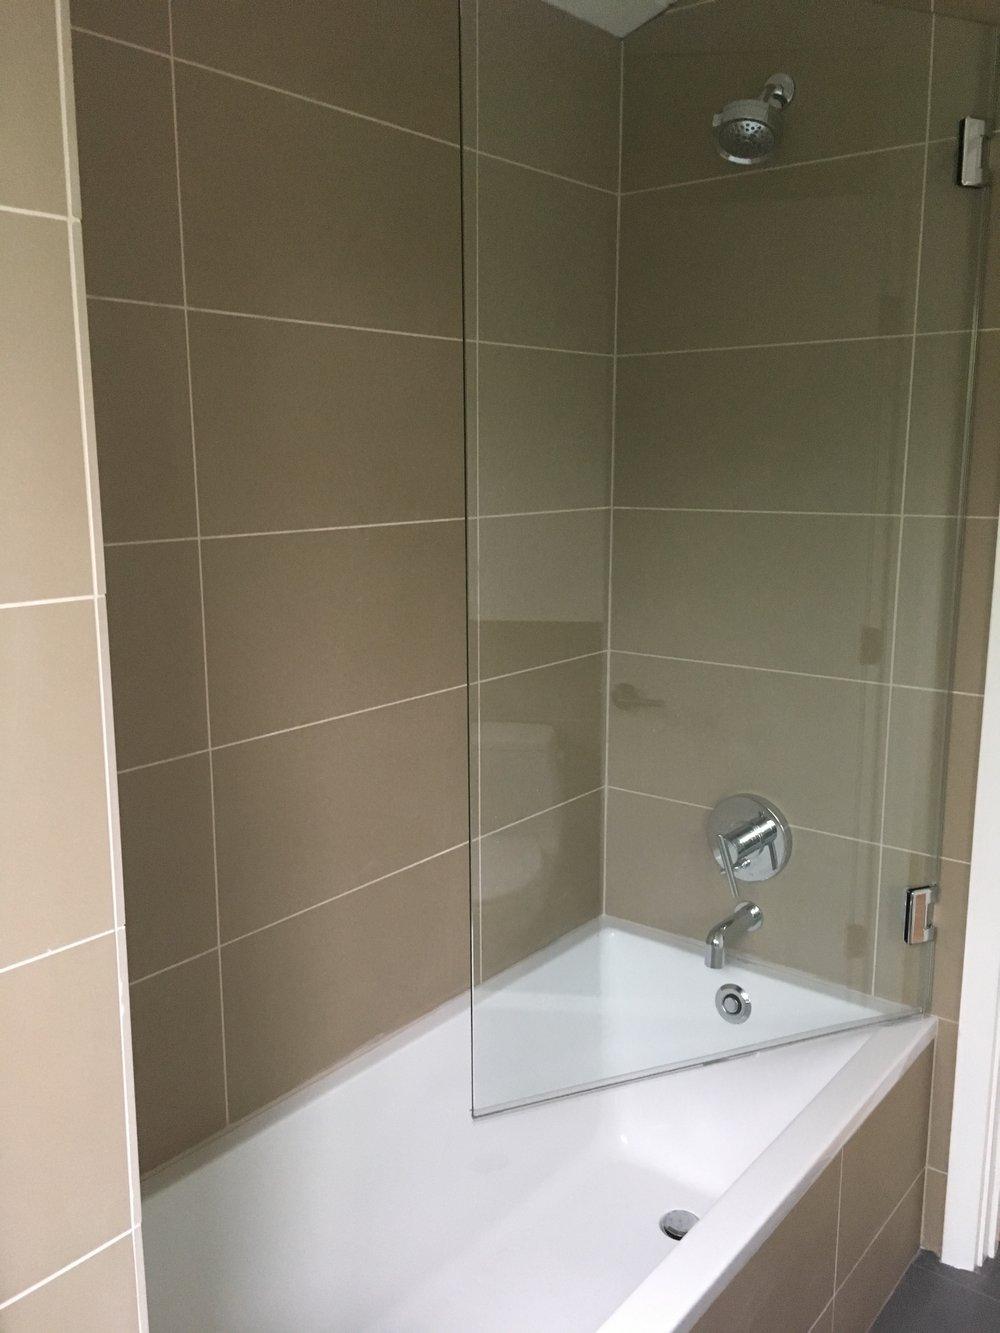 Funky Tub B Collection - Bathroom and Shower Ideas - purosion.com